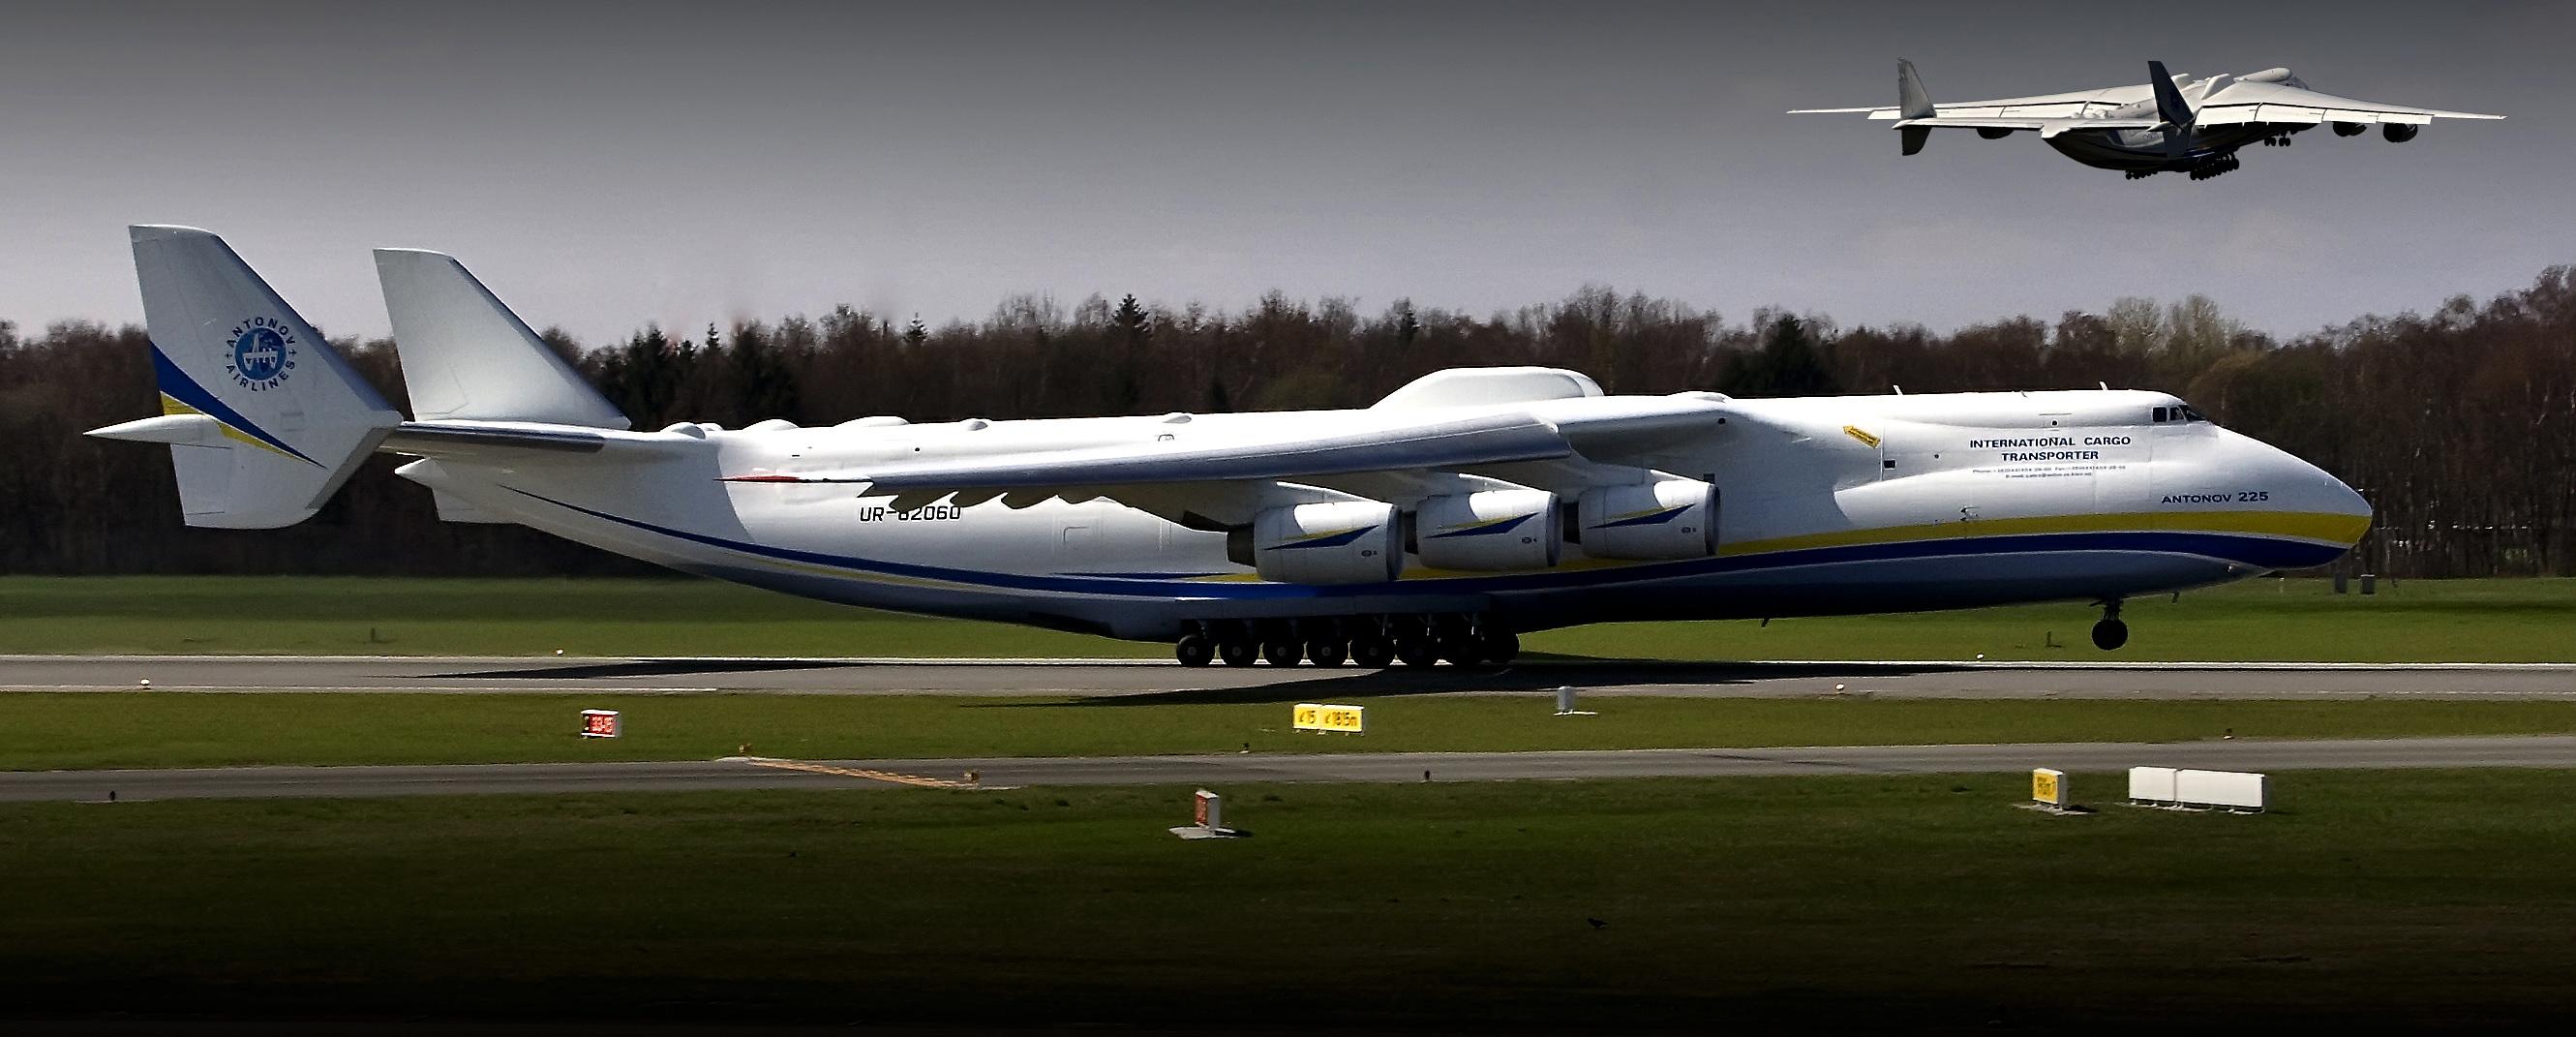 Antonov 225 beim Start in Hamburg